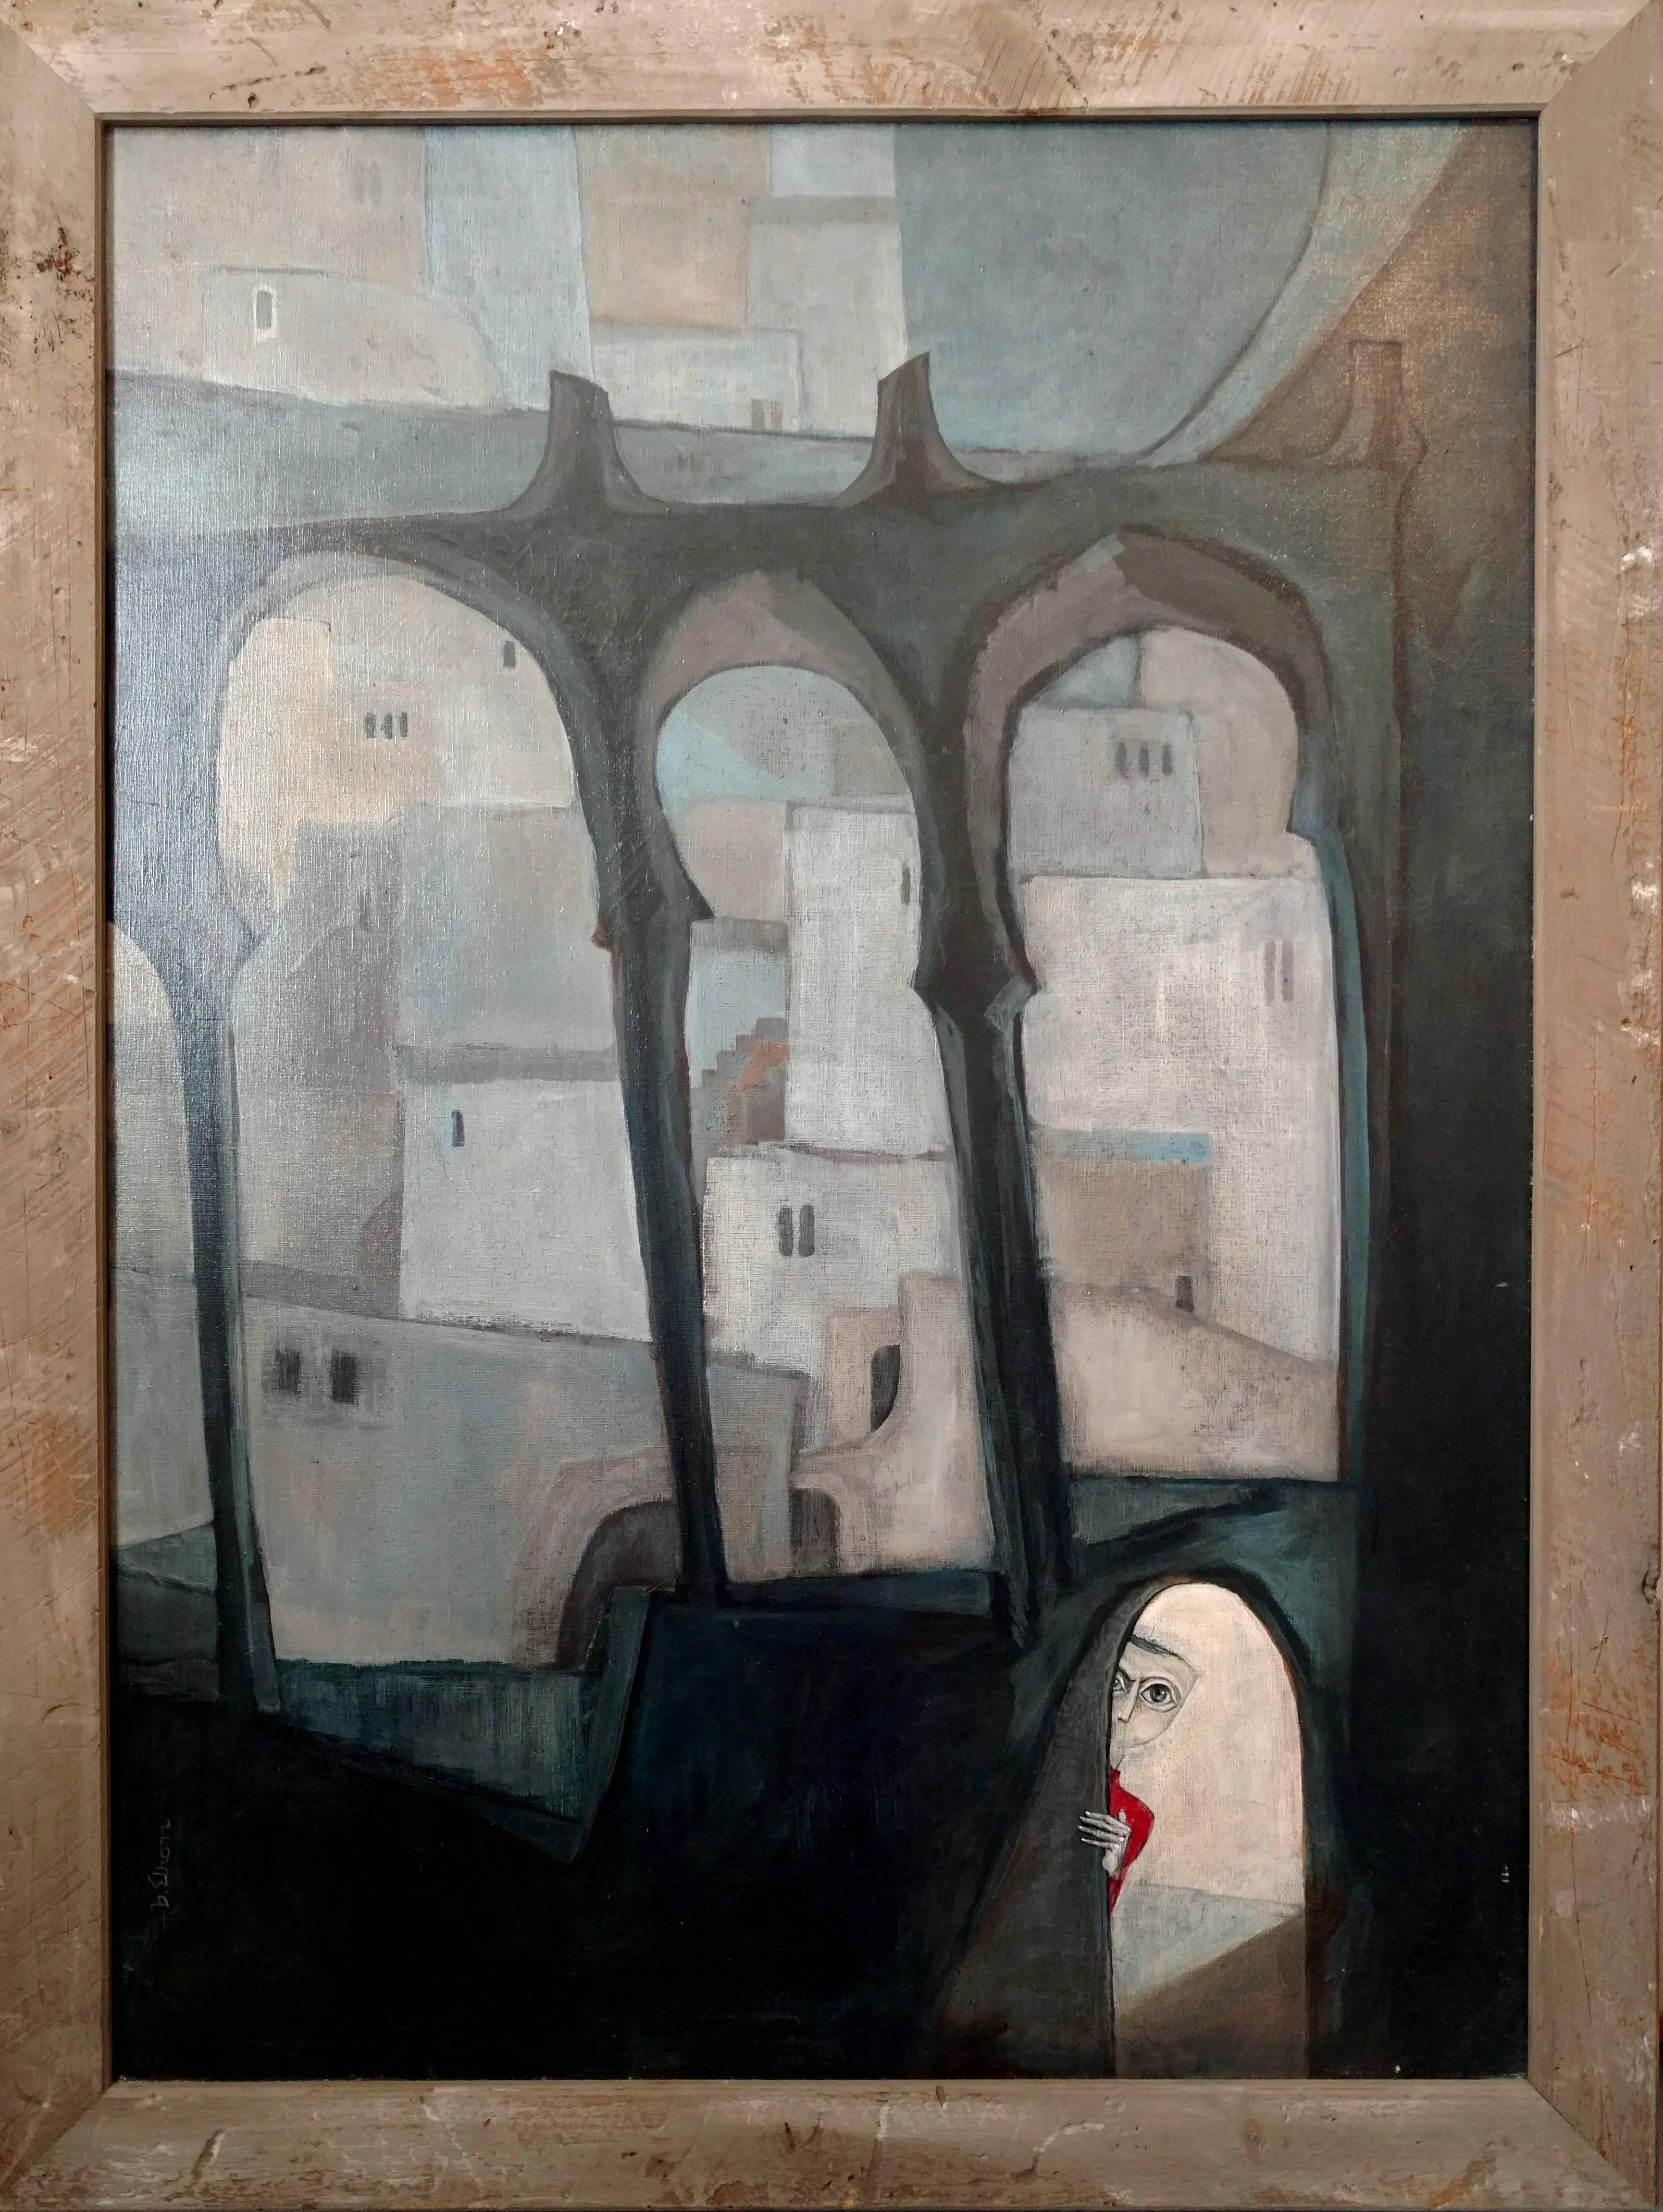 Large Surrealist Symbolist Painting, Peeking Child, Moorish Architectural Arches